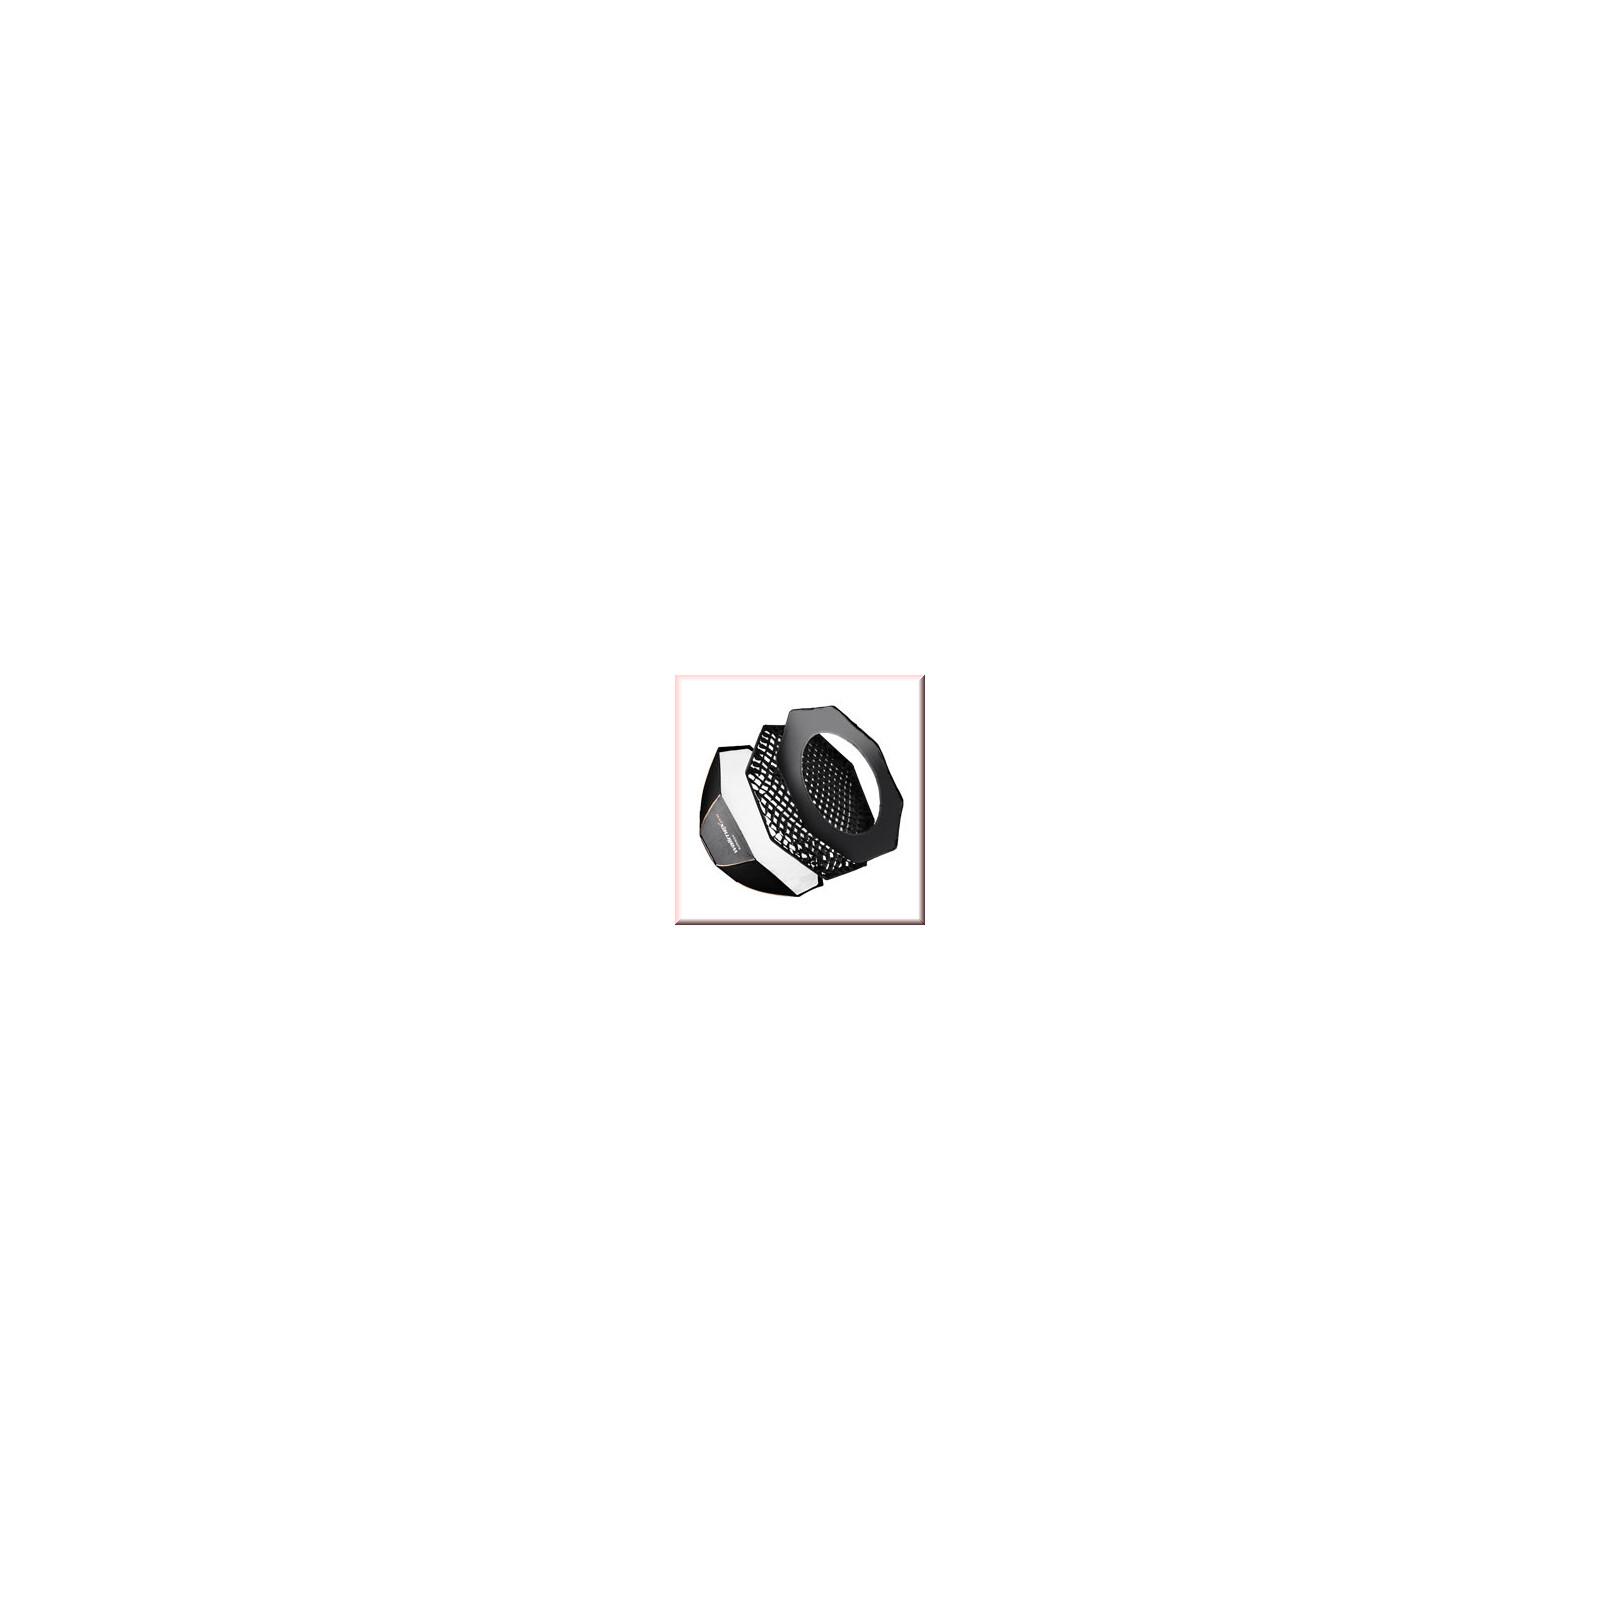 walimex pro Octa Softbox PLUS OL Ø170 Multiblitz V